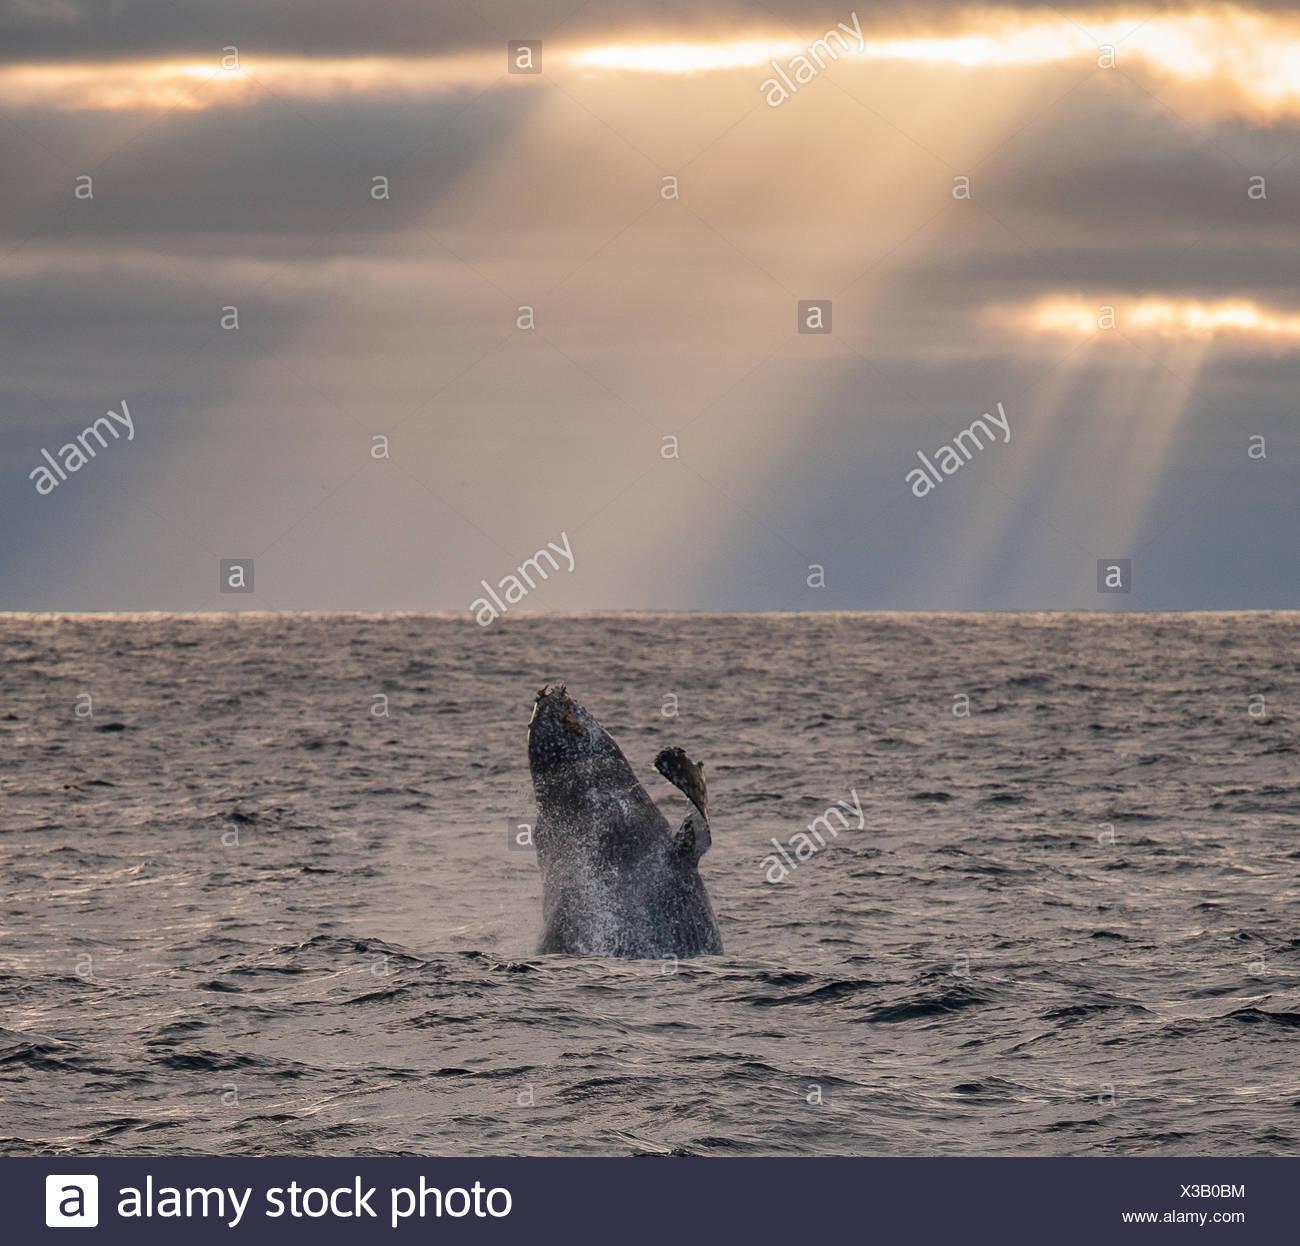 A humpback whale, Megaptera novaeangliae, breaching under rays of sunlight. Stock Photo